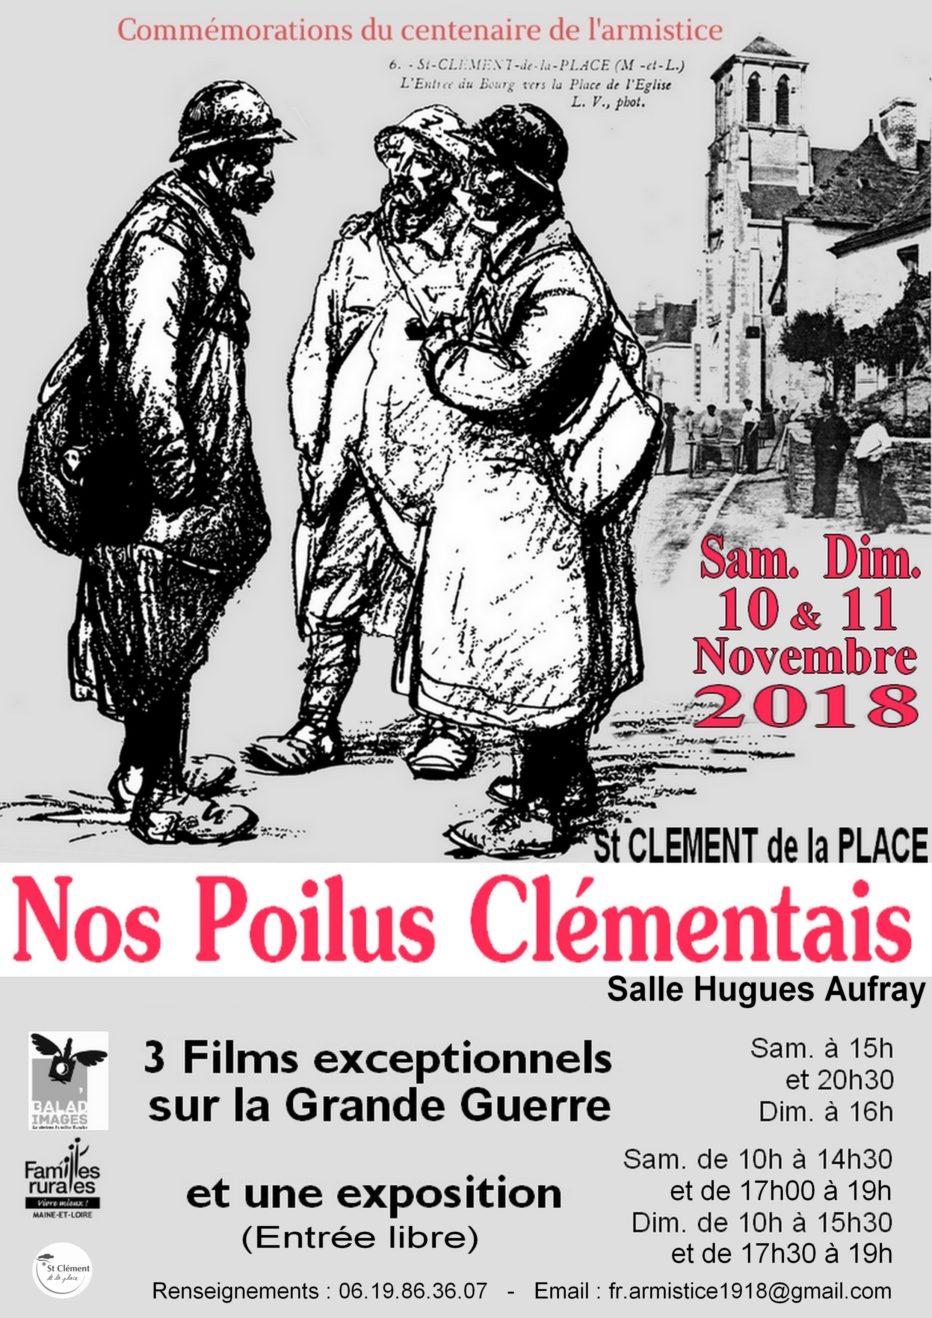 Nos Poilus Clémentais | Grande Guerre